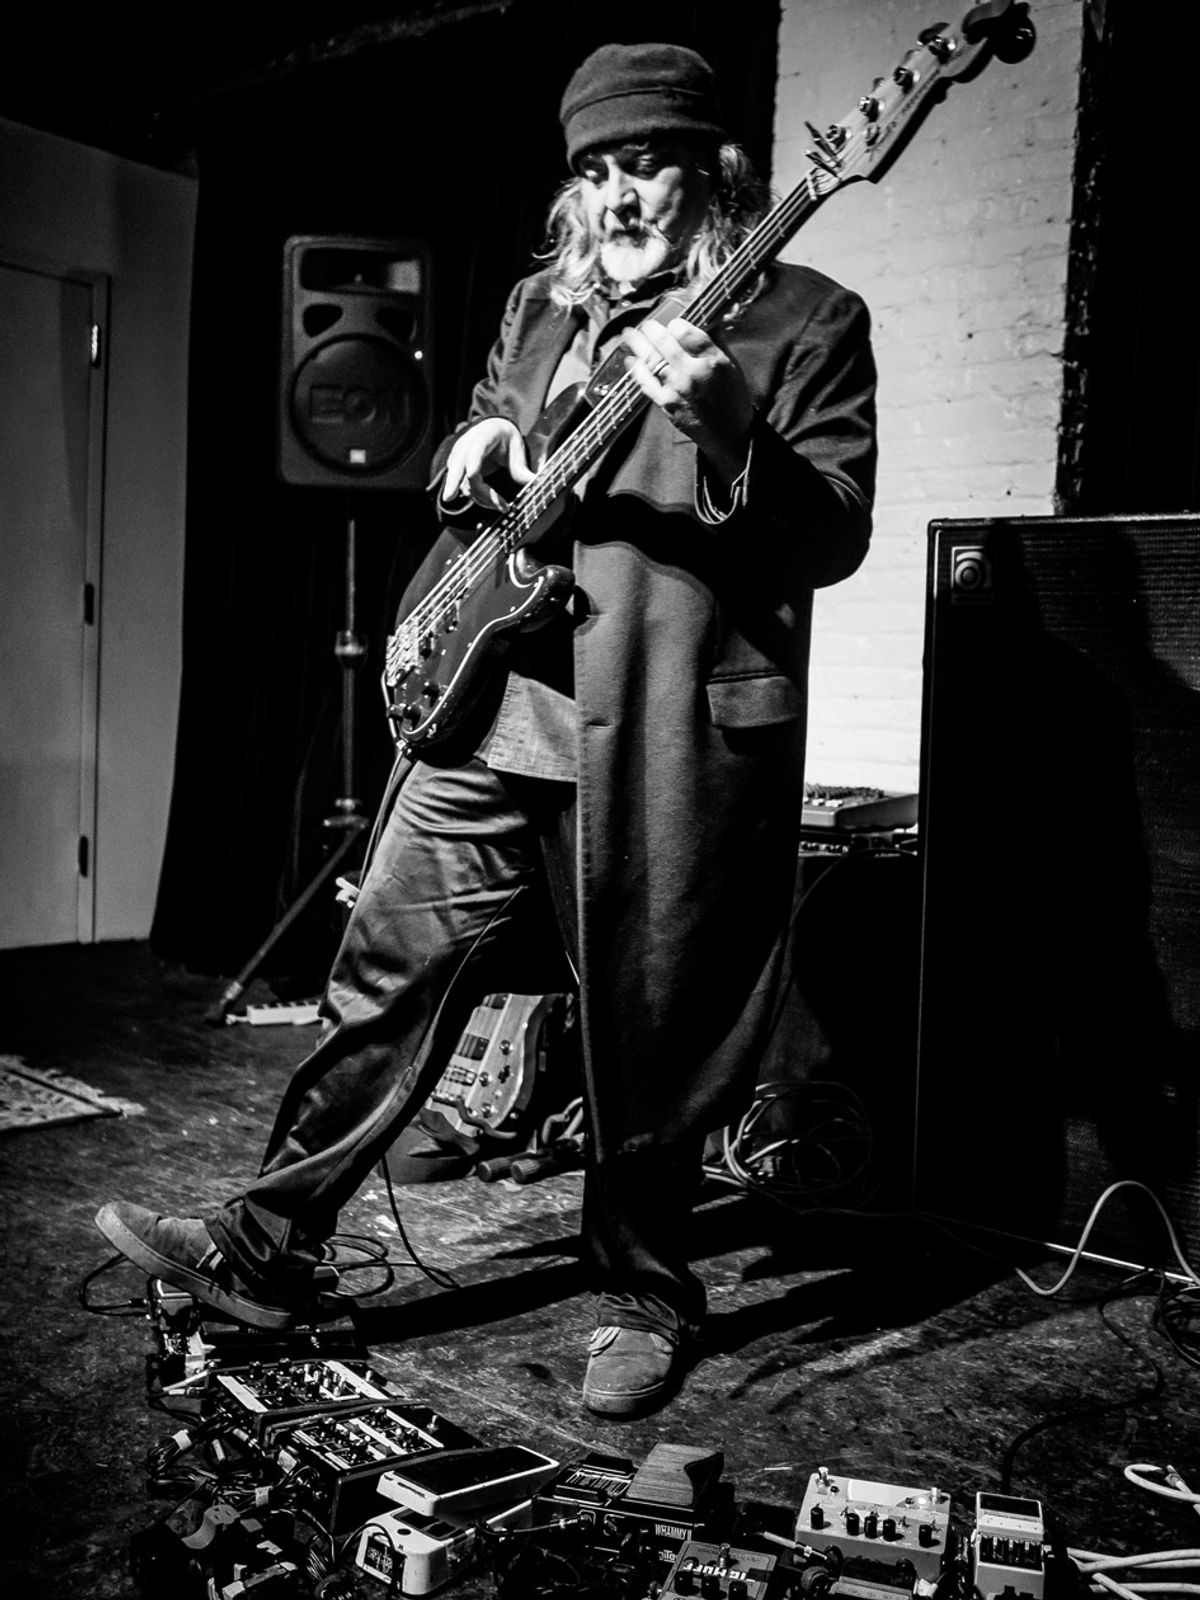 Bill Laswell: Four Strings, Zero Limits